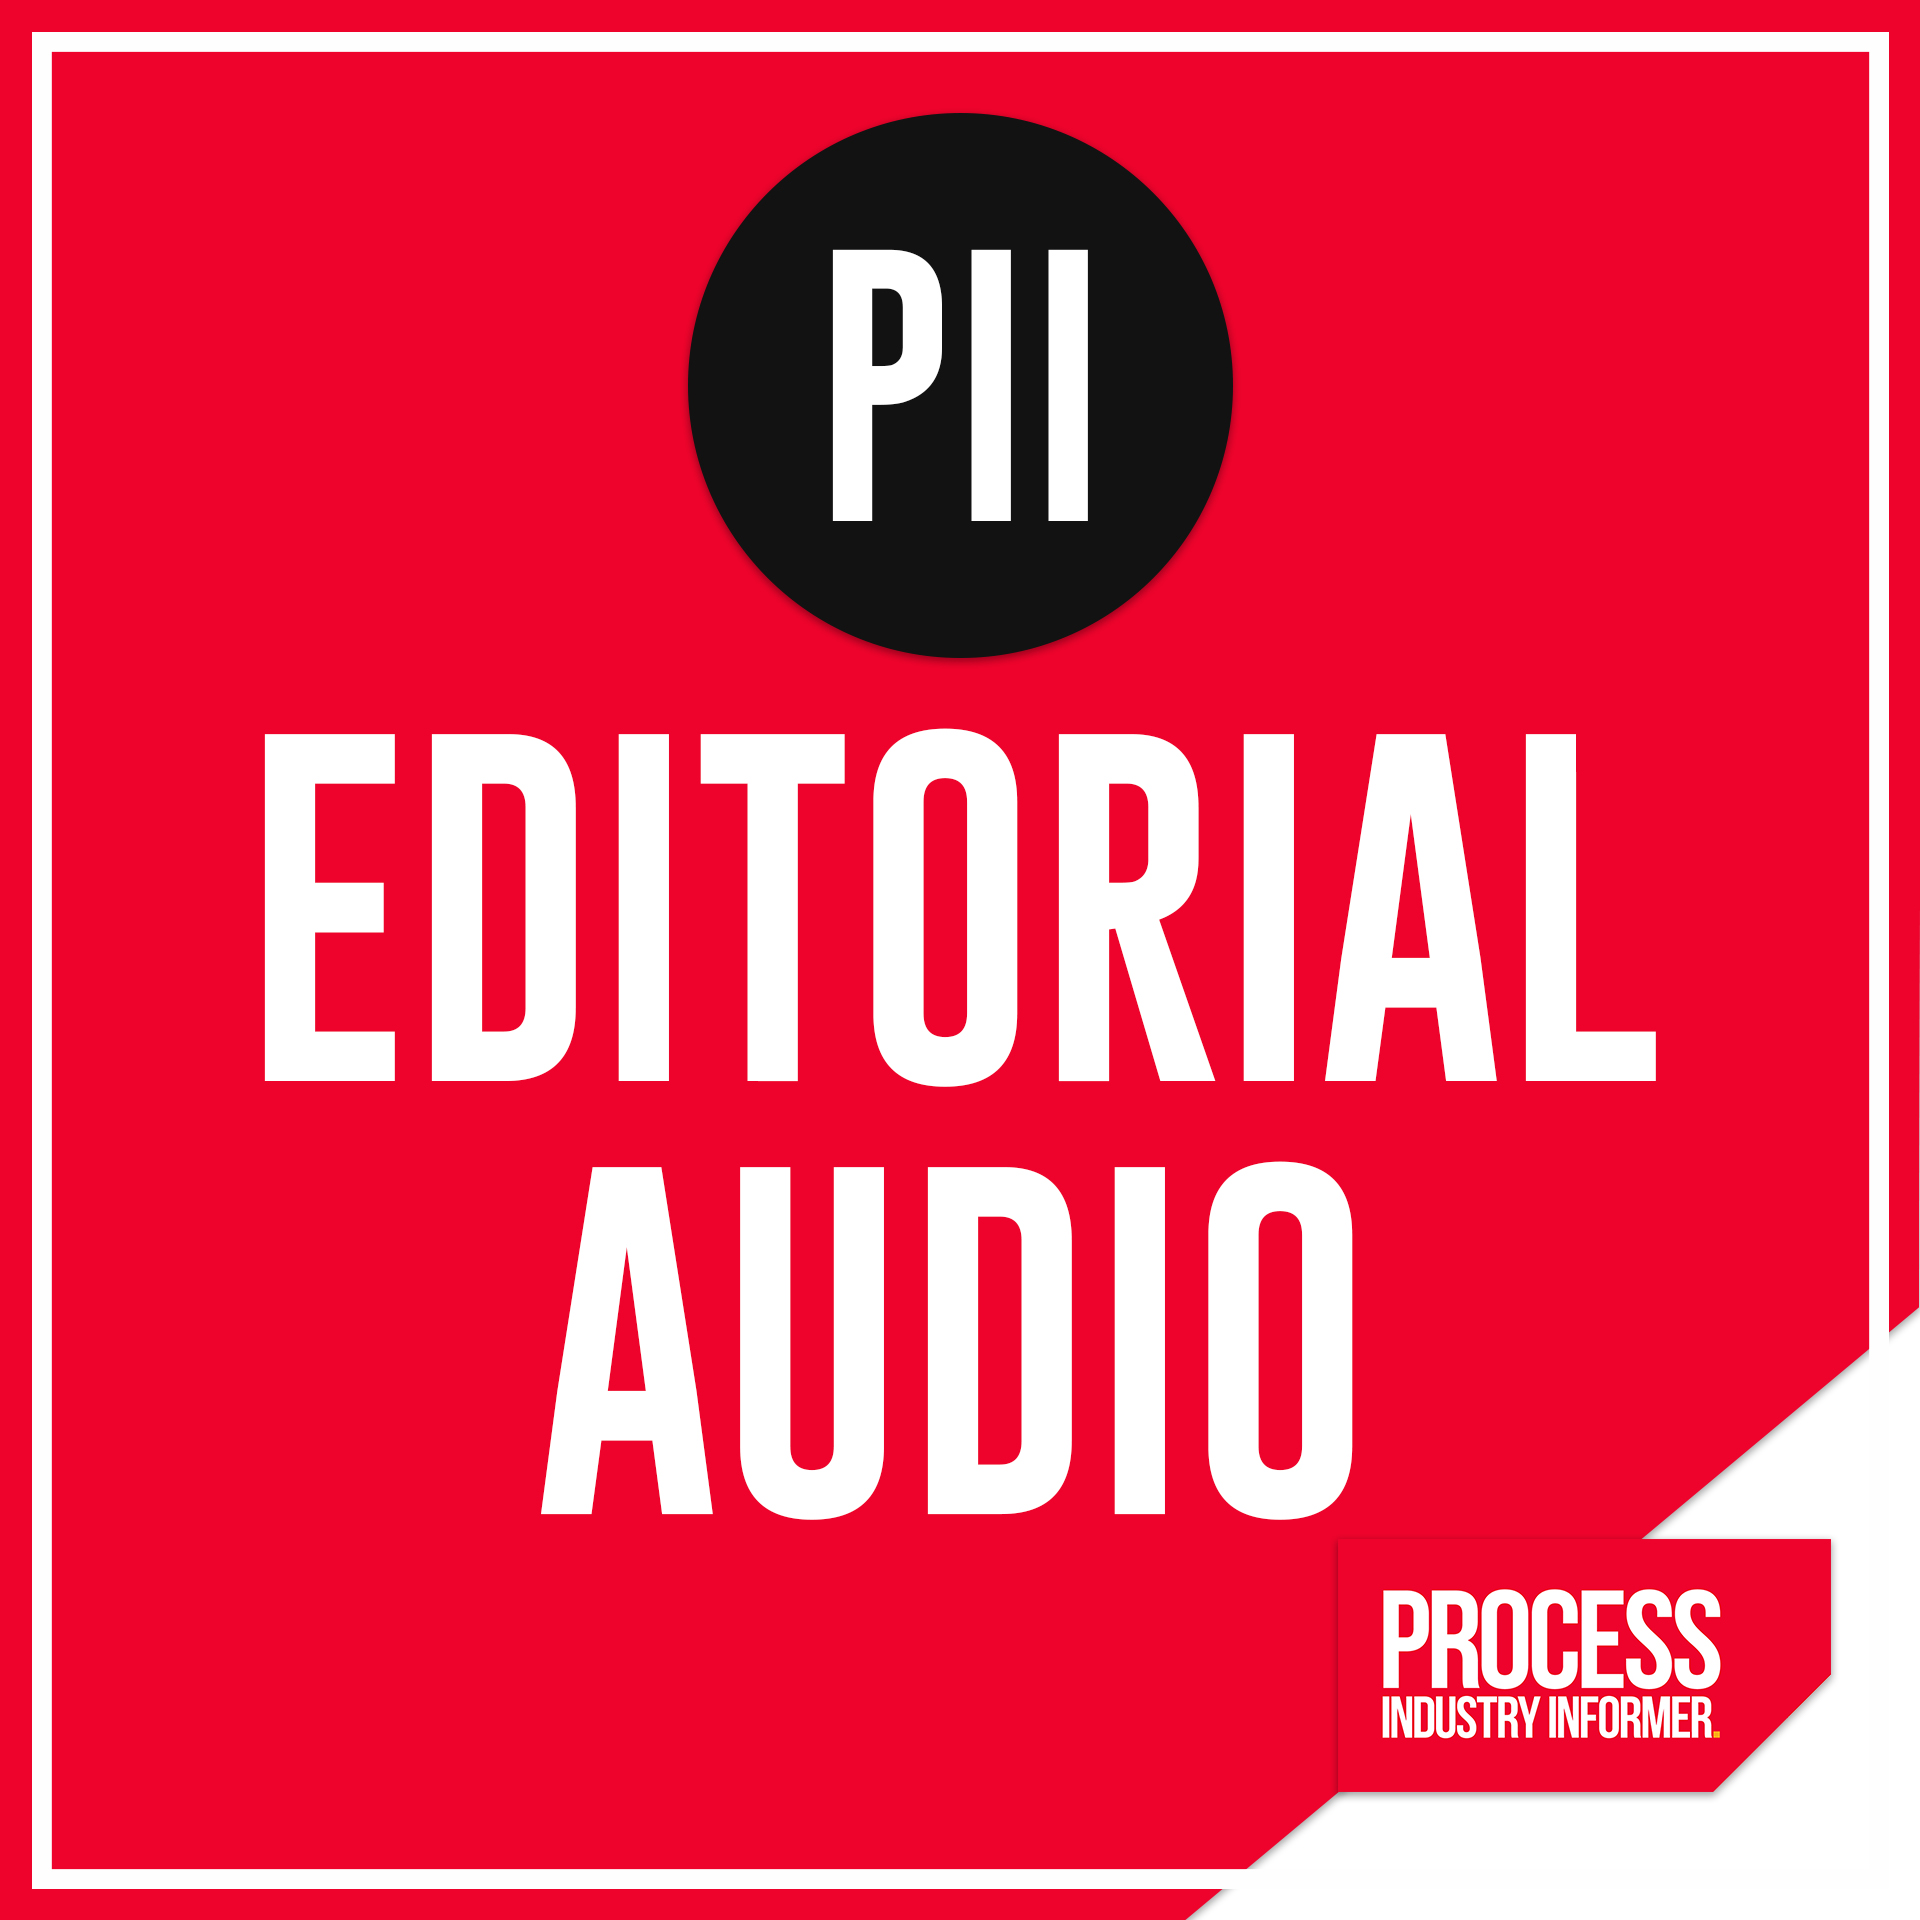 PII Editorial Audio show art